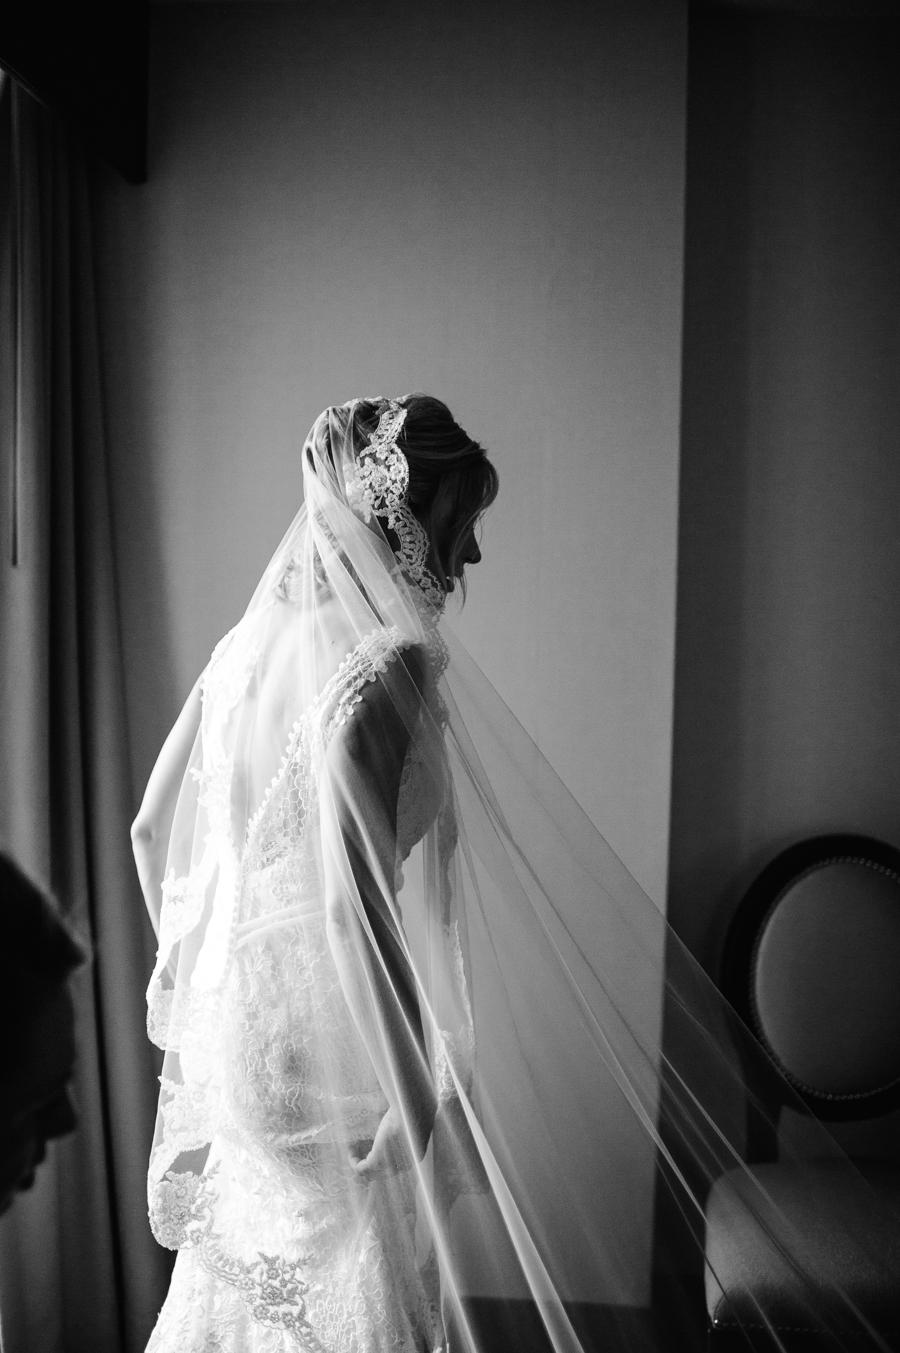 White Marsh Valley Country Club Wedding Photographer Philadelphia Weddings Stylish Philadelphia Wedding Photographer Longbrook Photography-41.jpg